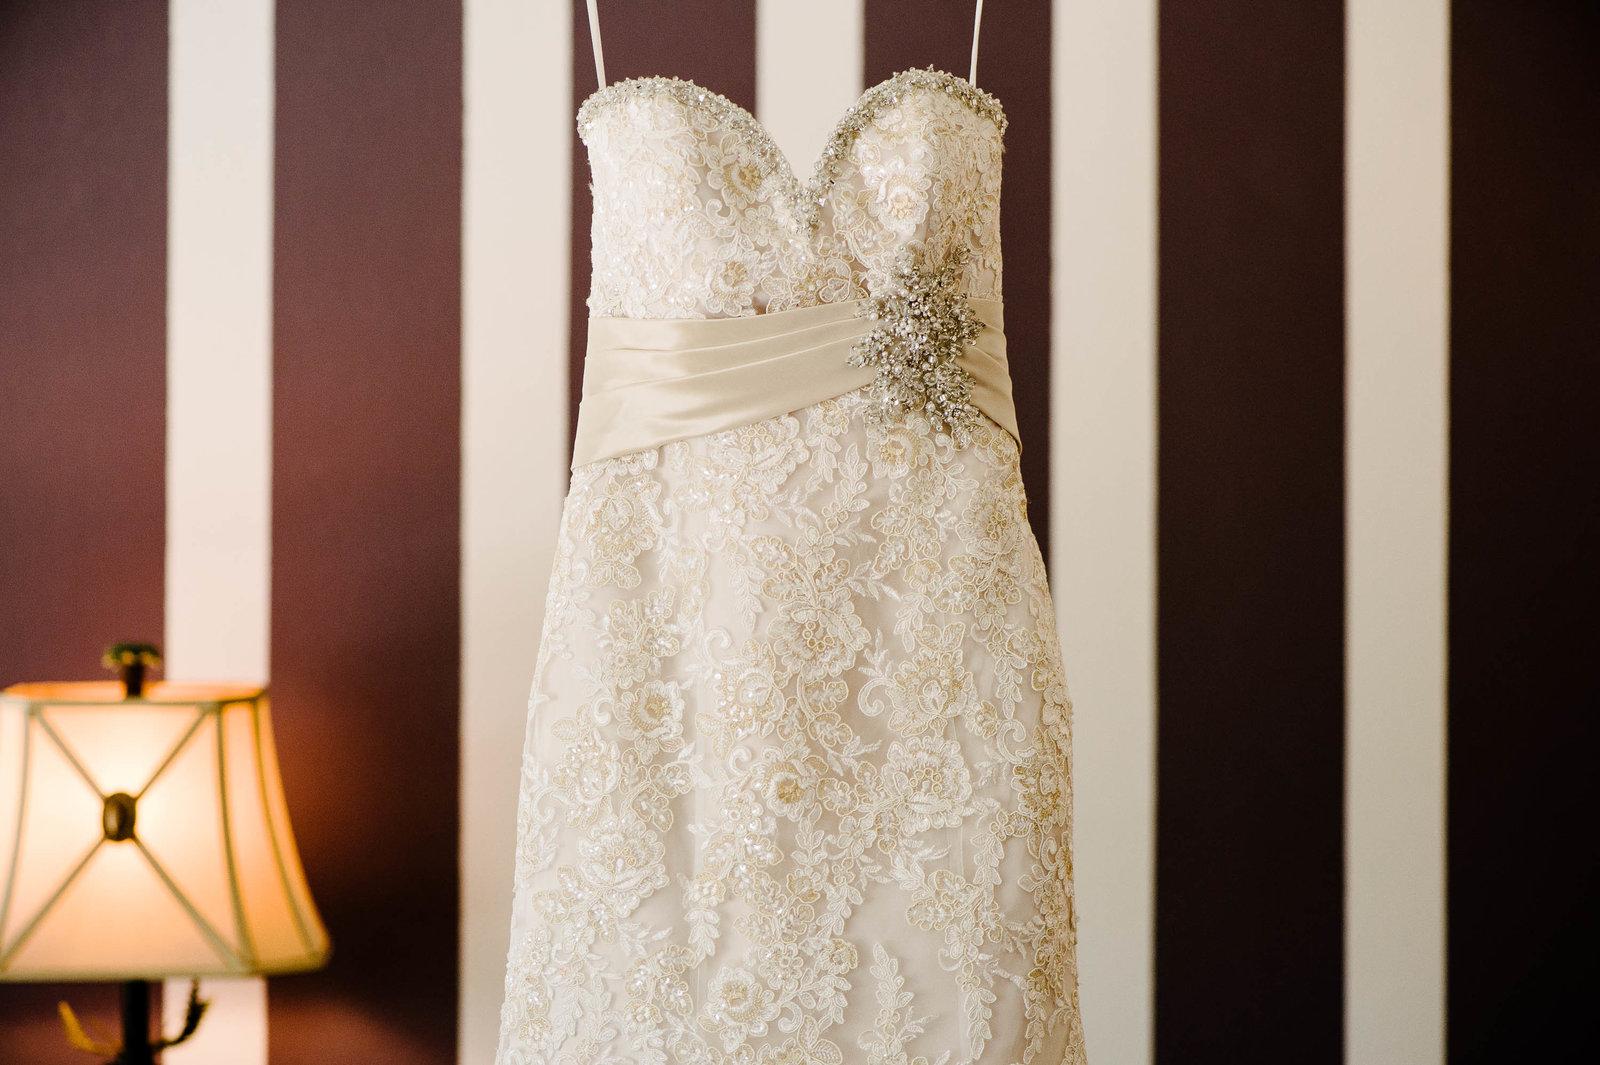 103-El-paso-wedding-photographer-El Paso Wedding Photographer_D09